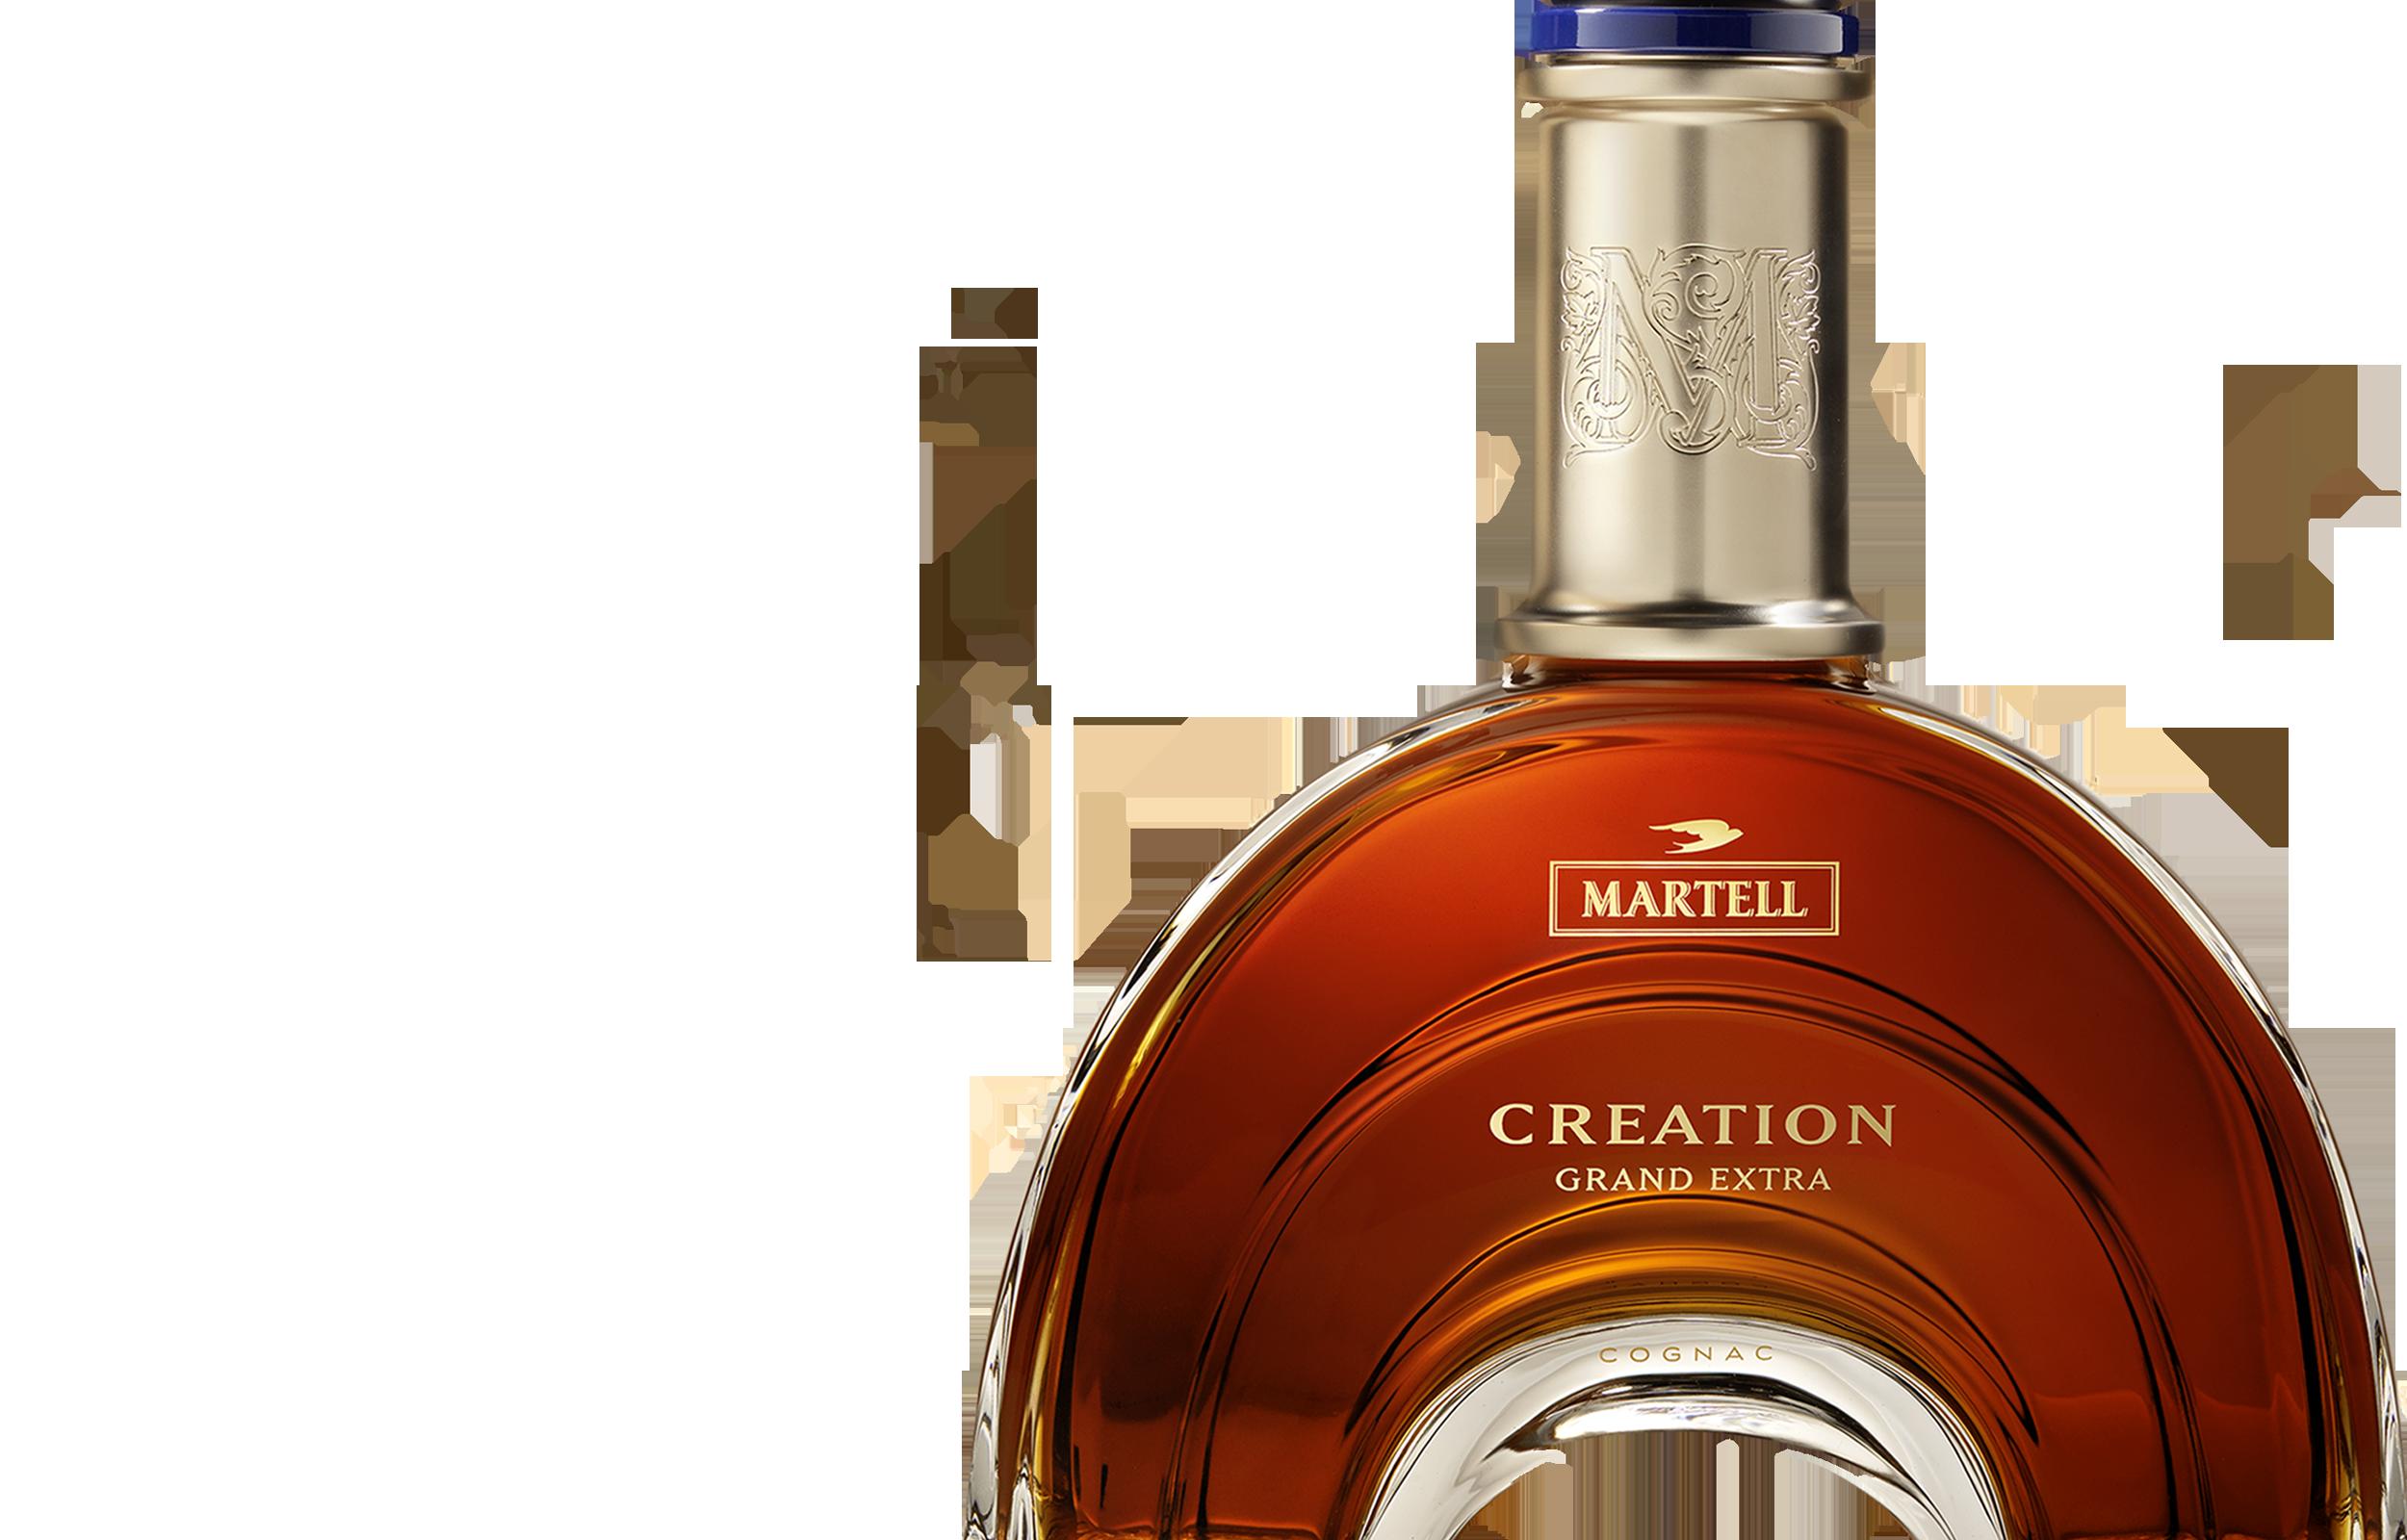 création grand extra a martell cognac